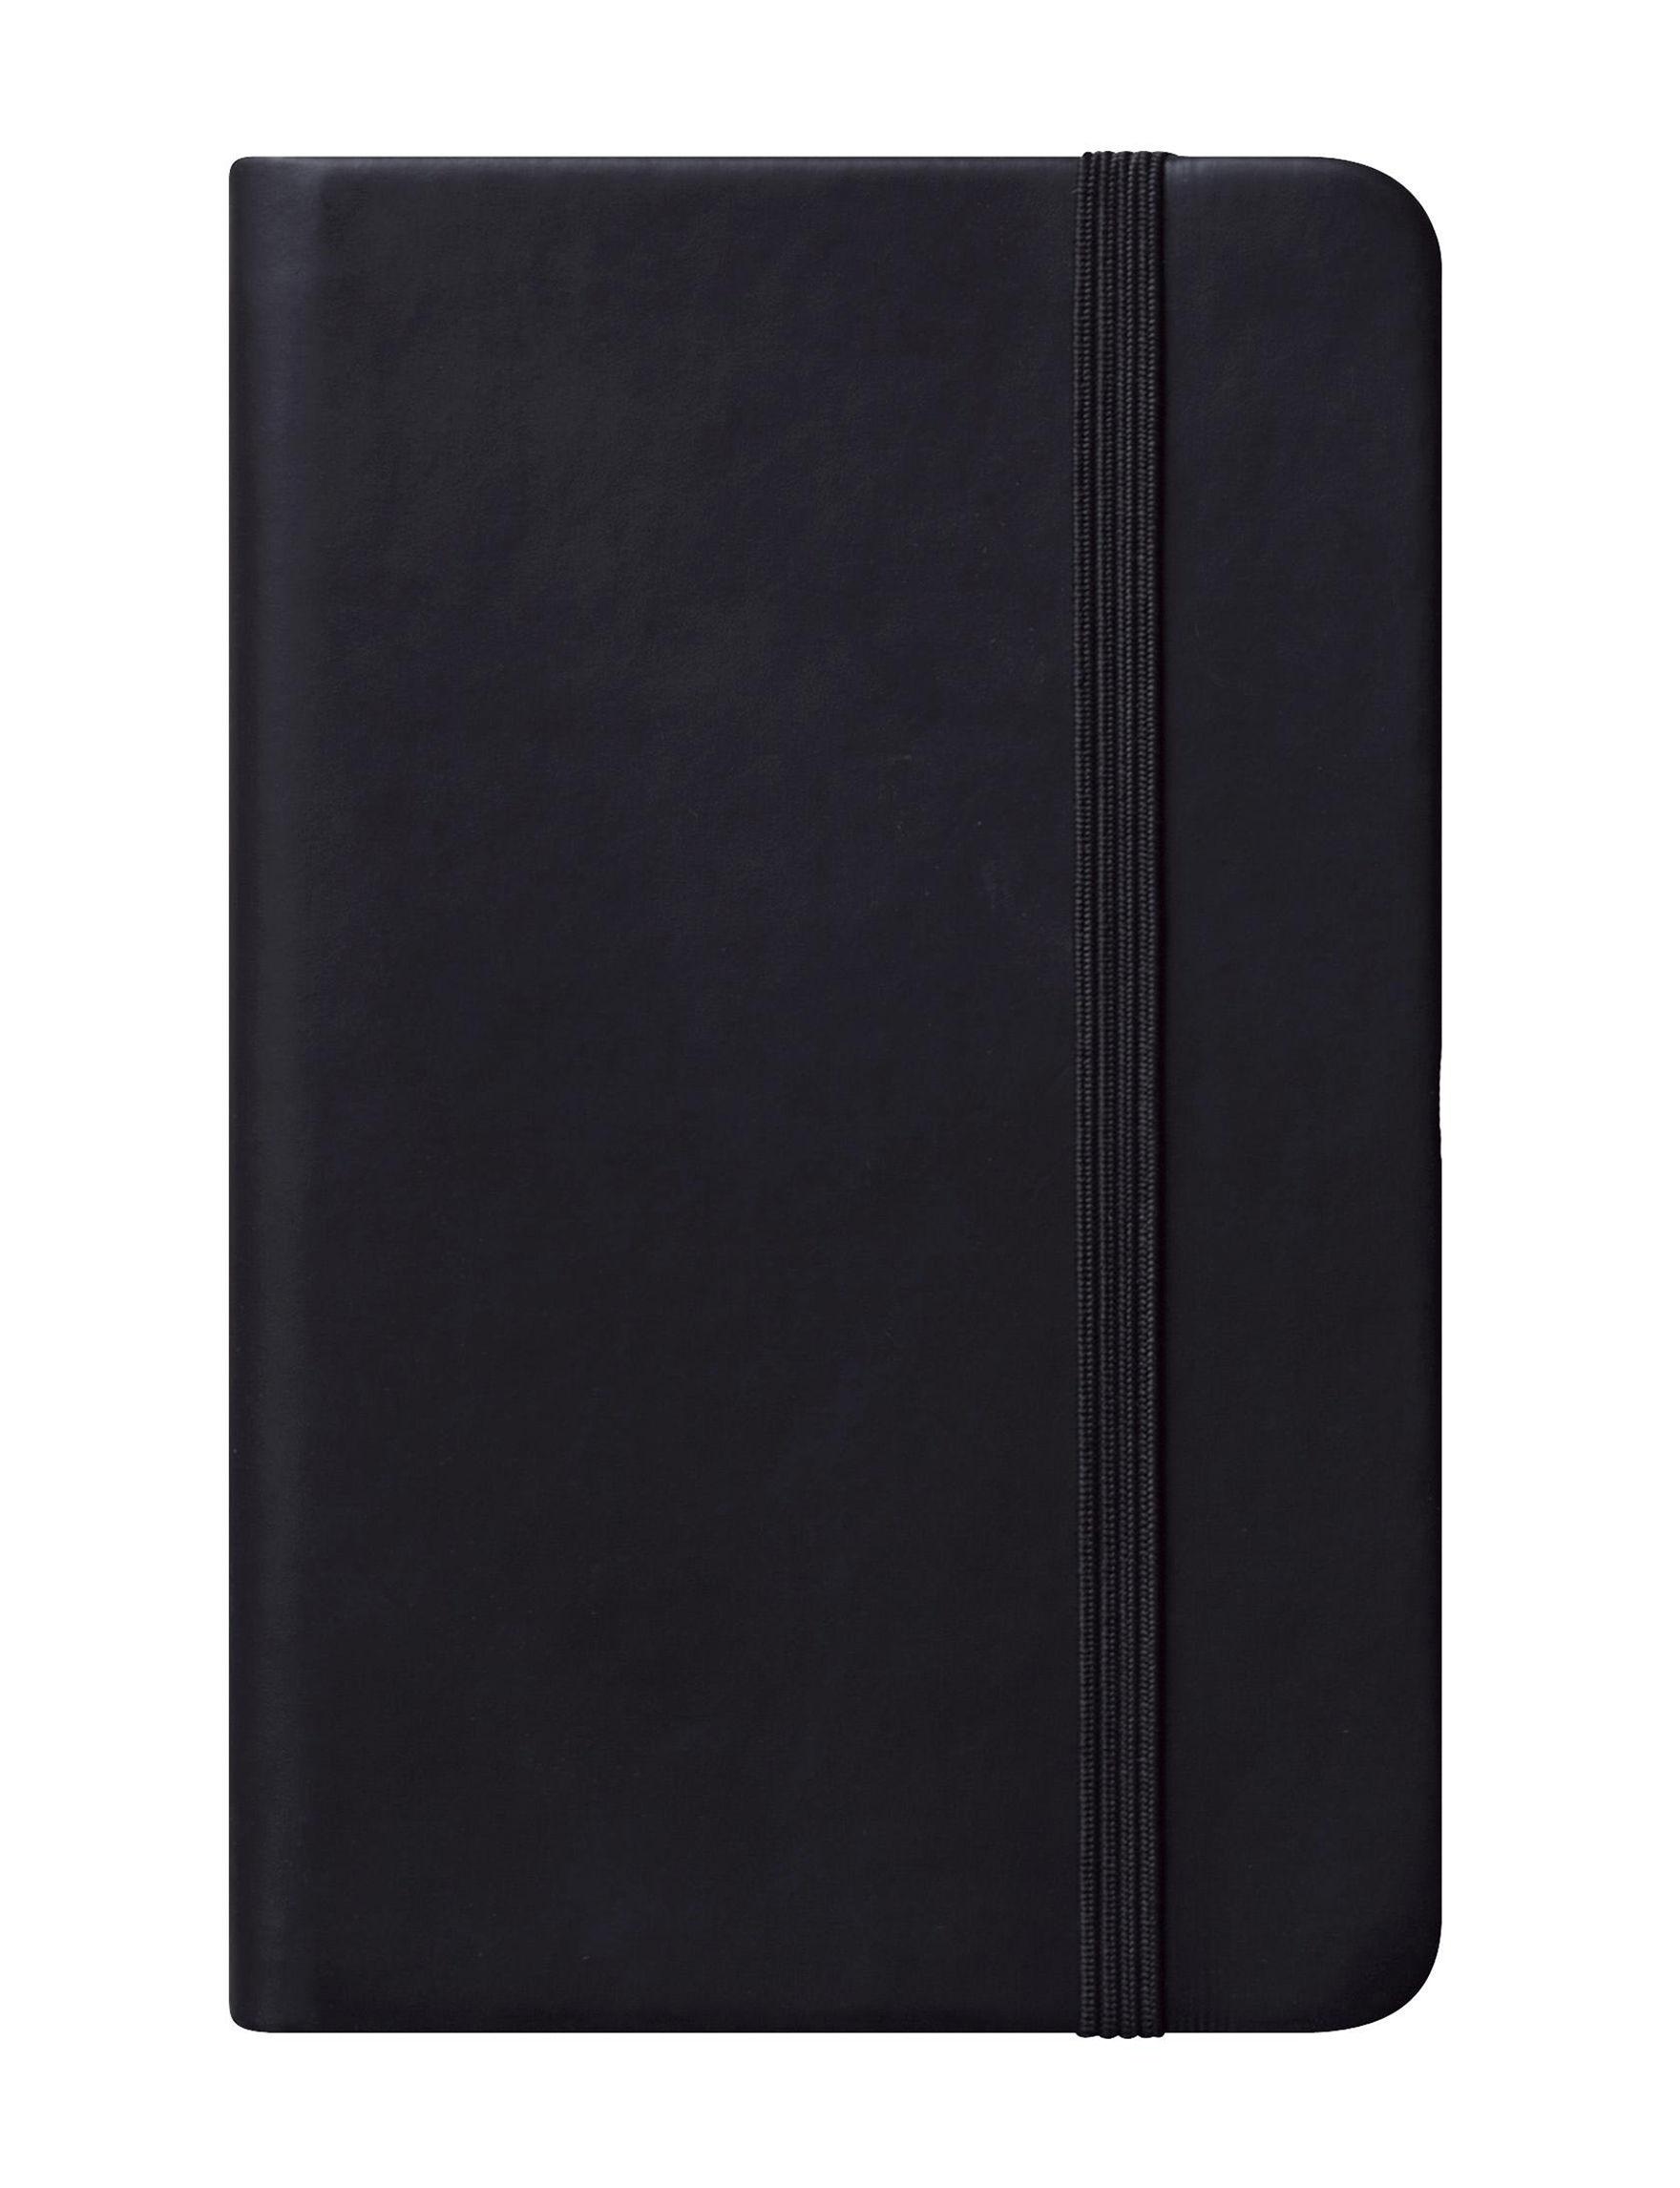 Eccolo Black Journals & Notepads School & Office Supplies